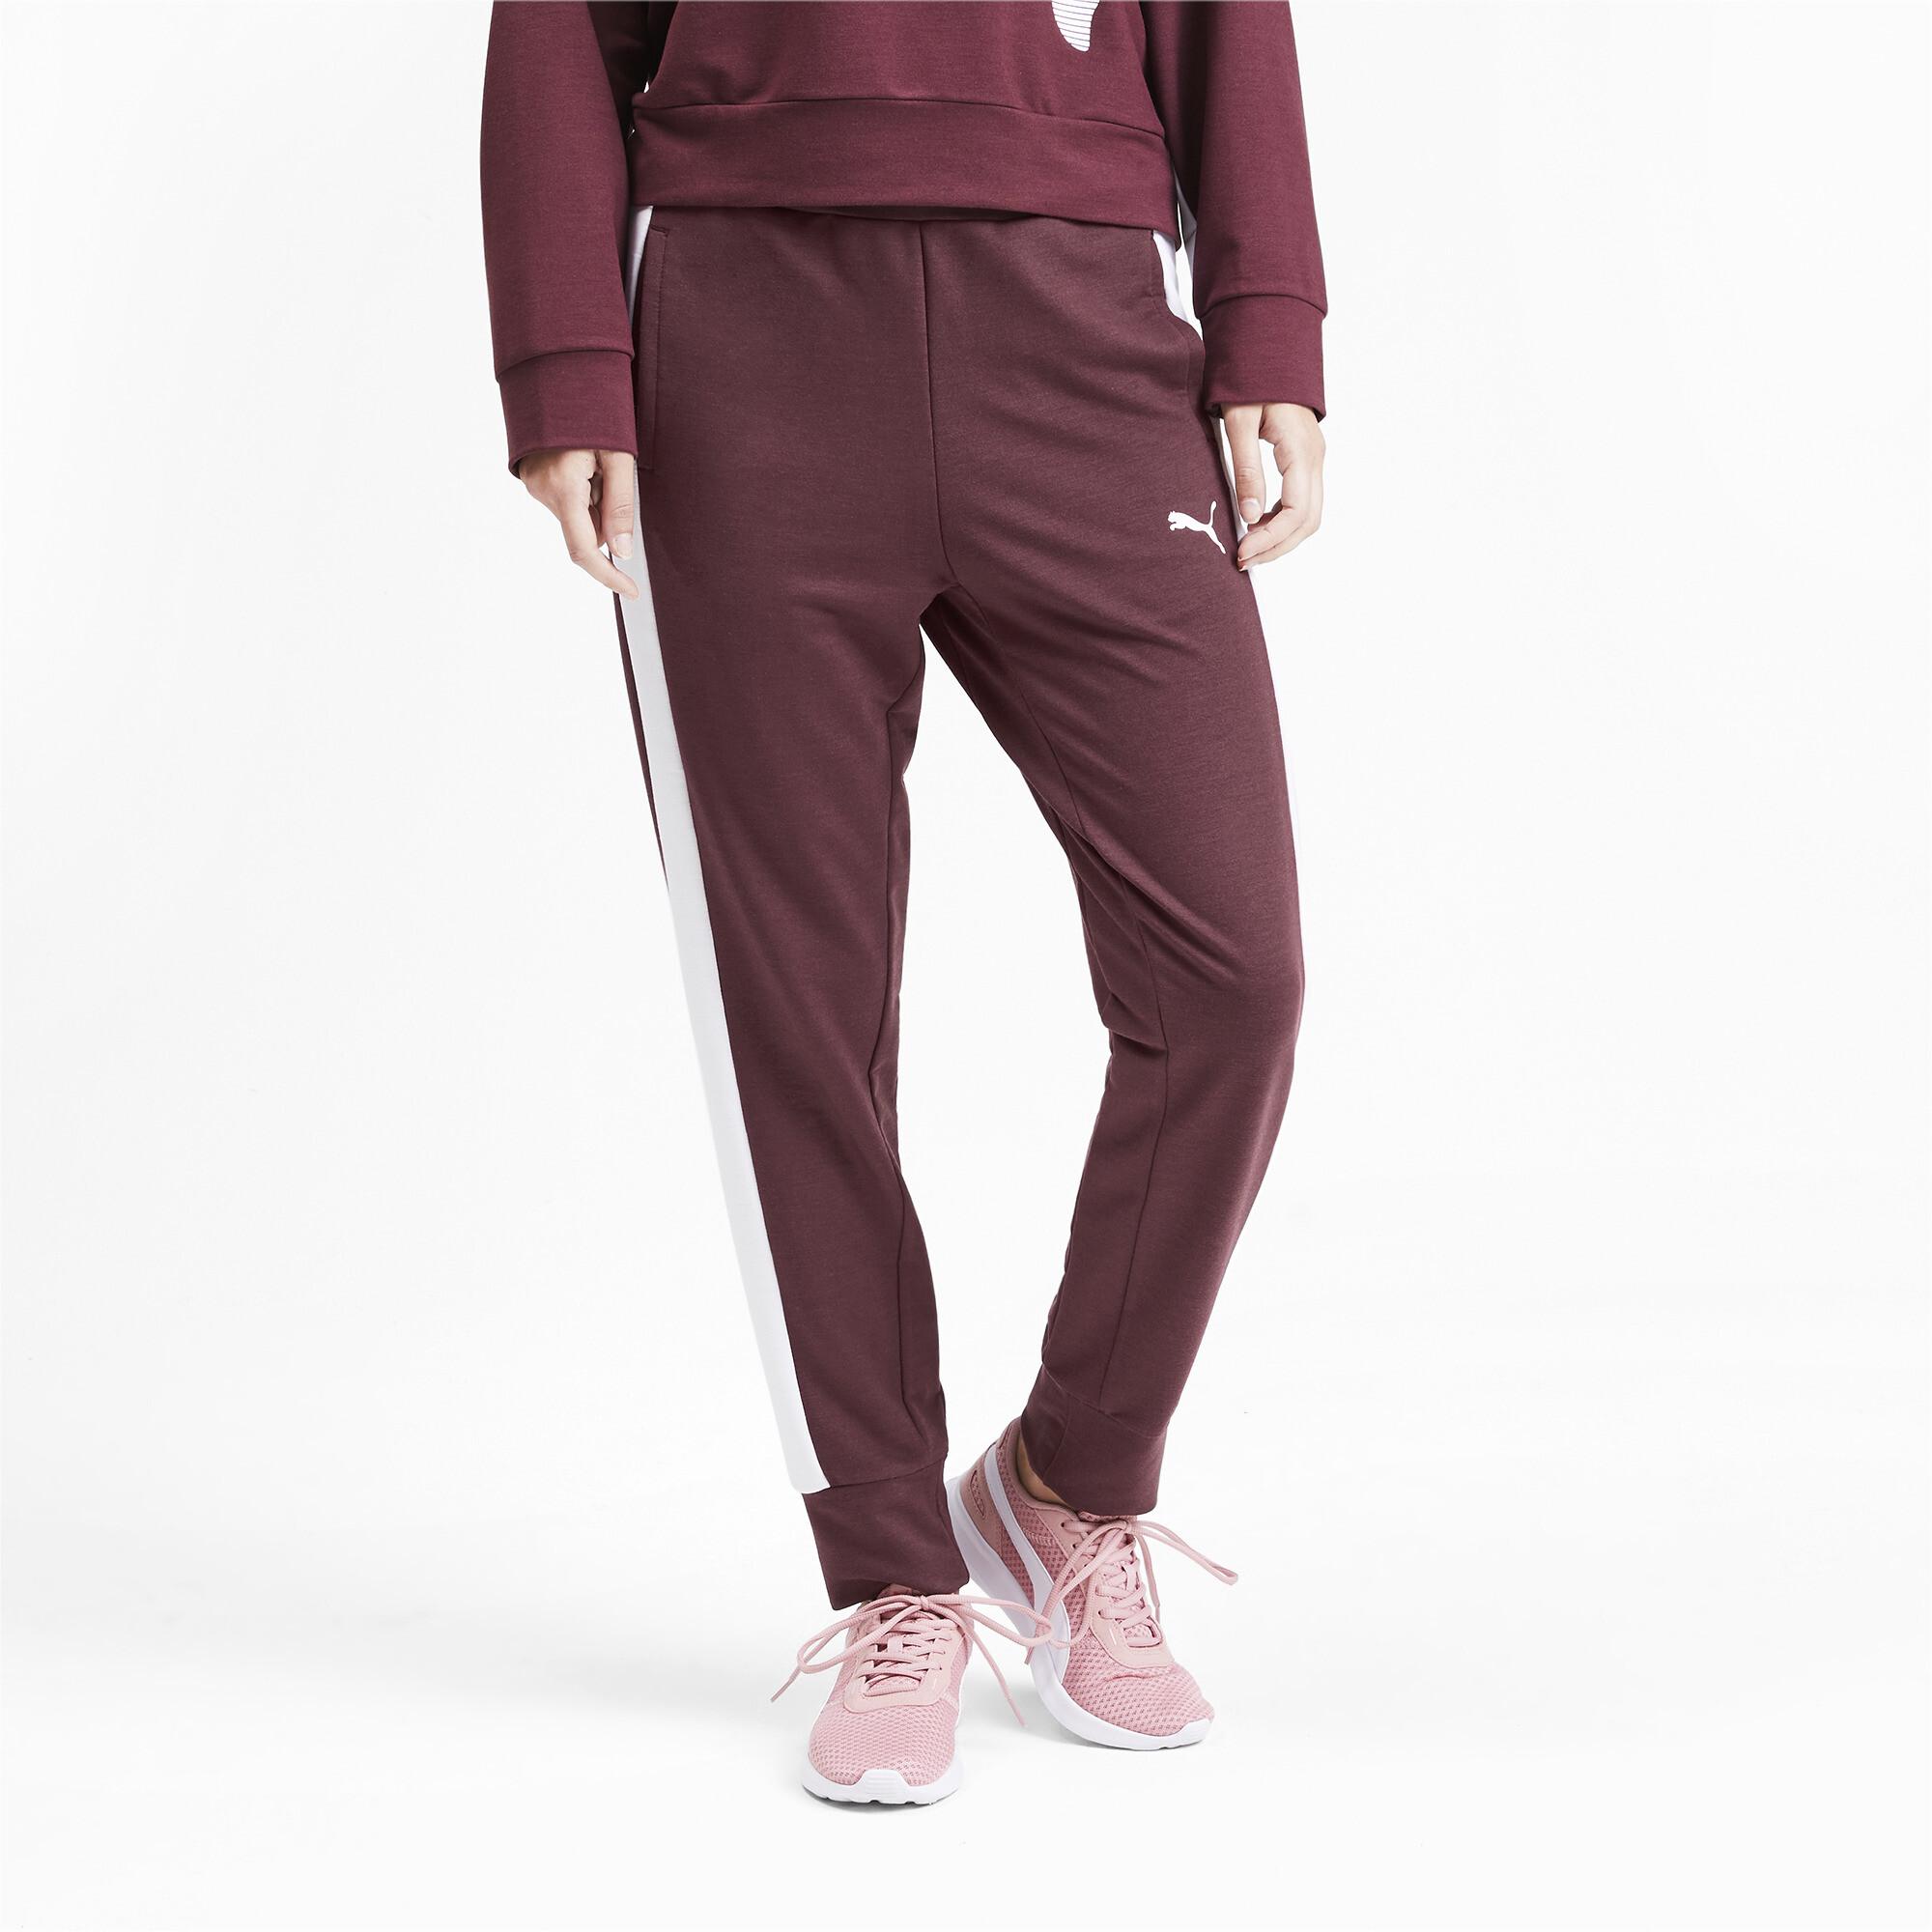 PUMA-Modern-Sports-Women-039-s-Track-Pants-Women-Knitted-Pants-Basics thumbnail 4